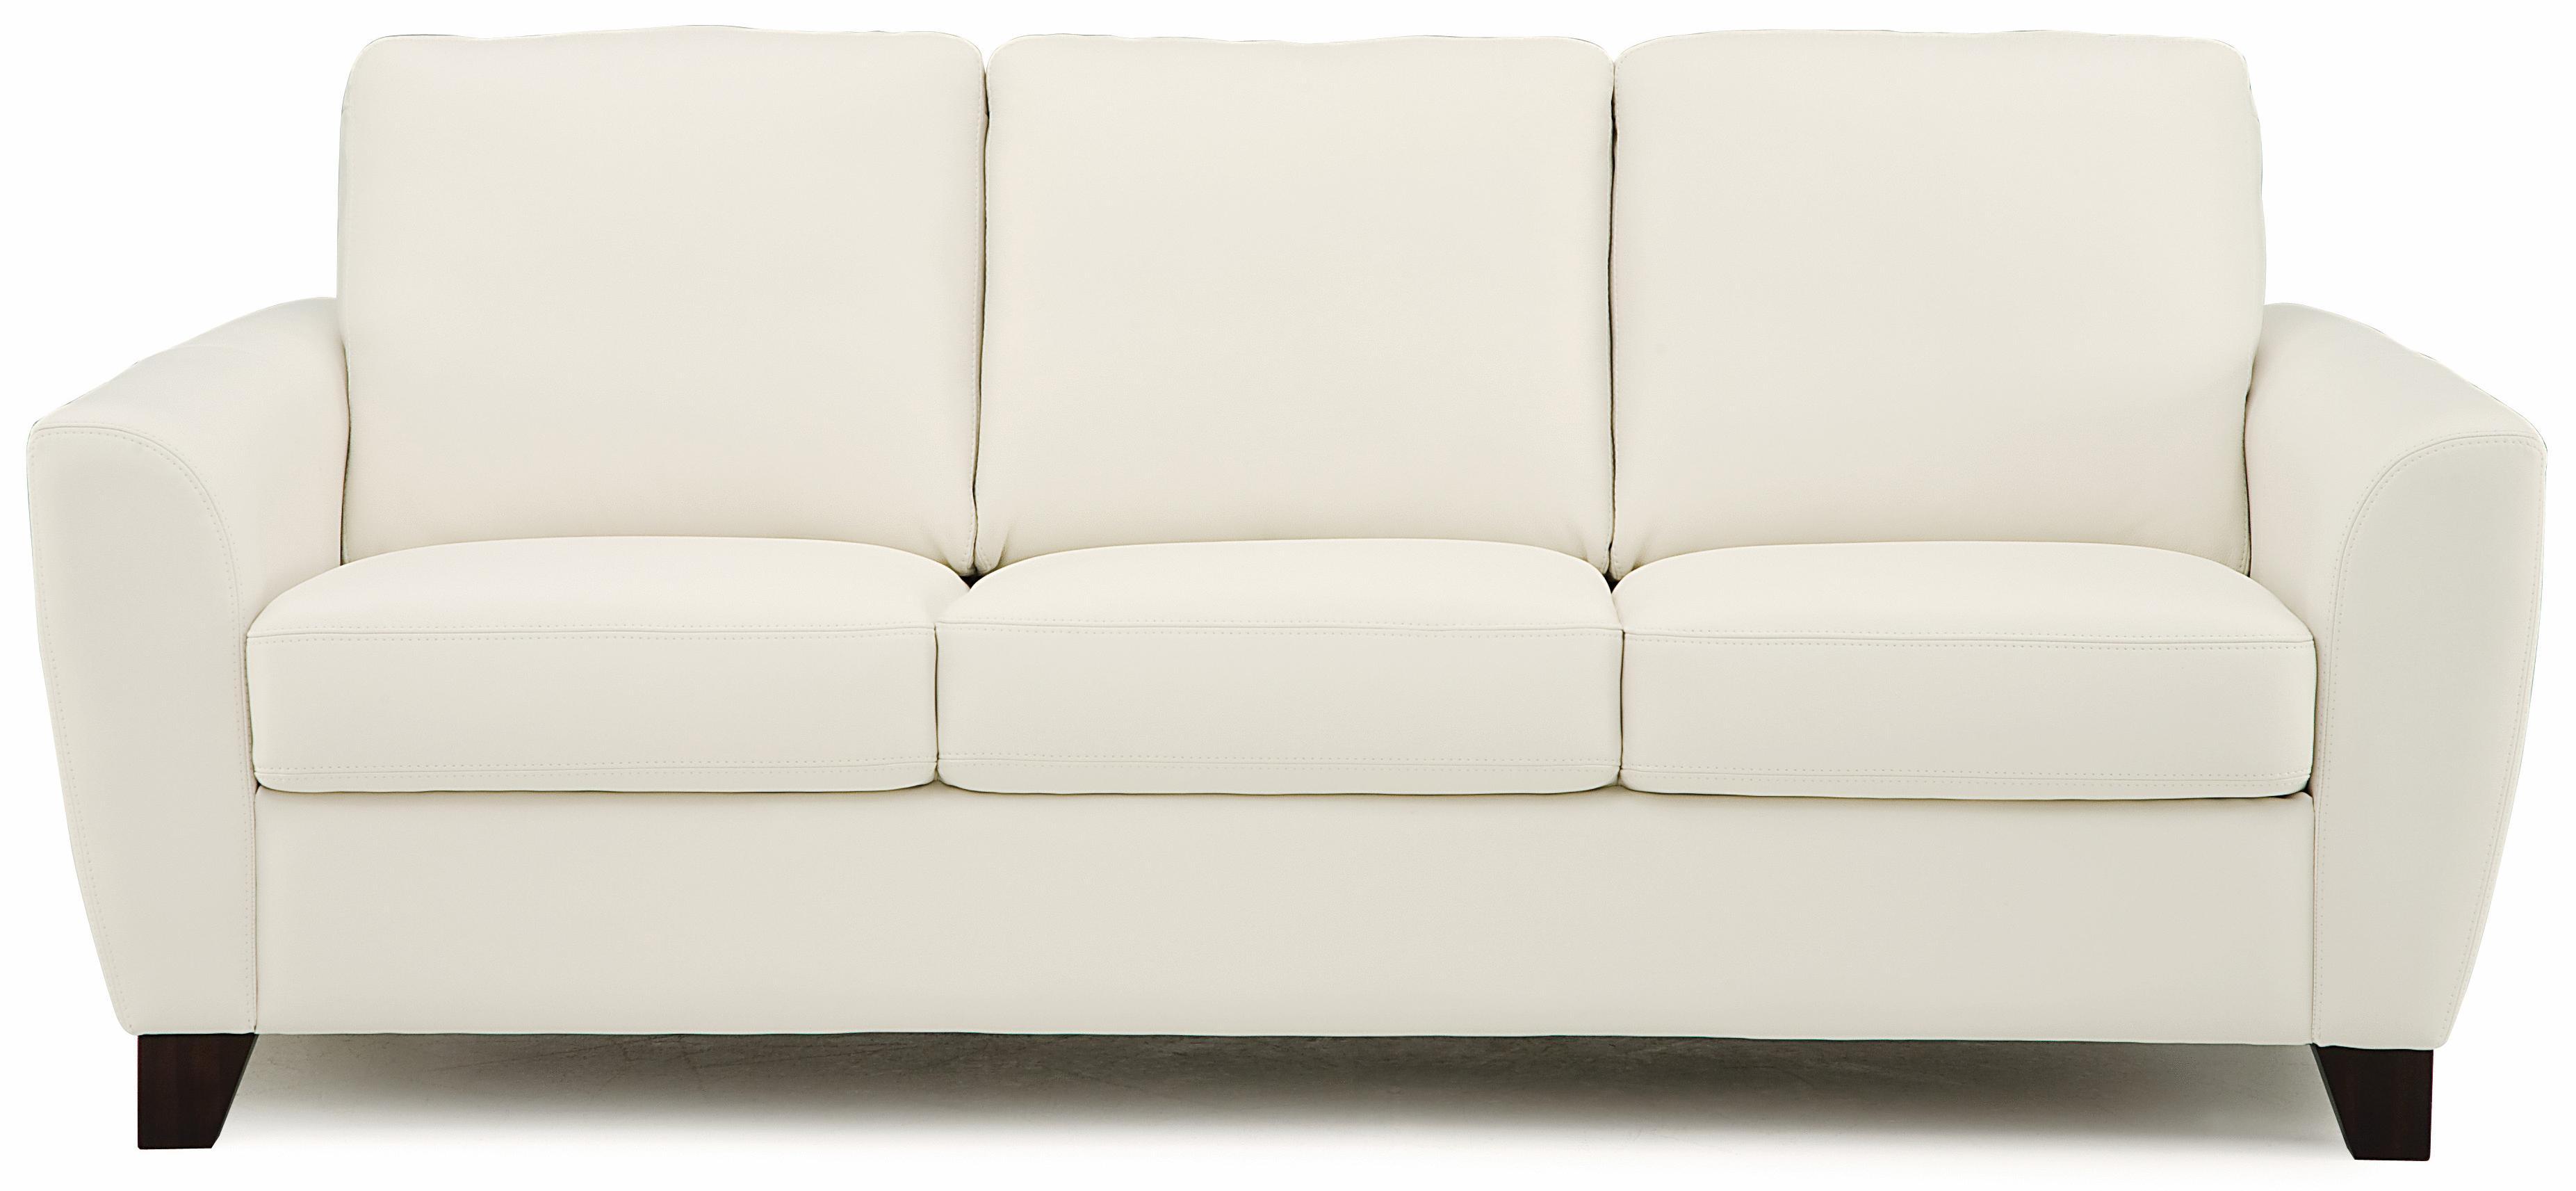 palliser stationary sofas large high back corner sofa marymount contemporary with flair